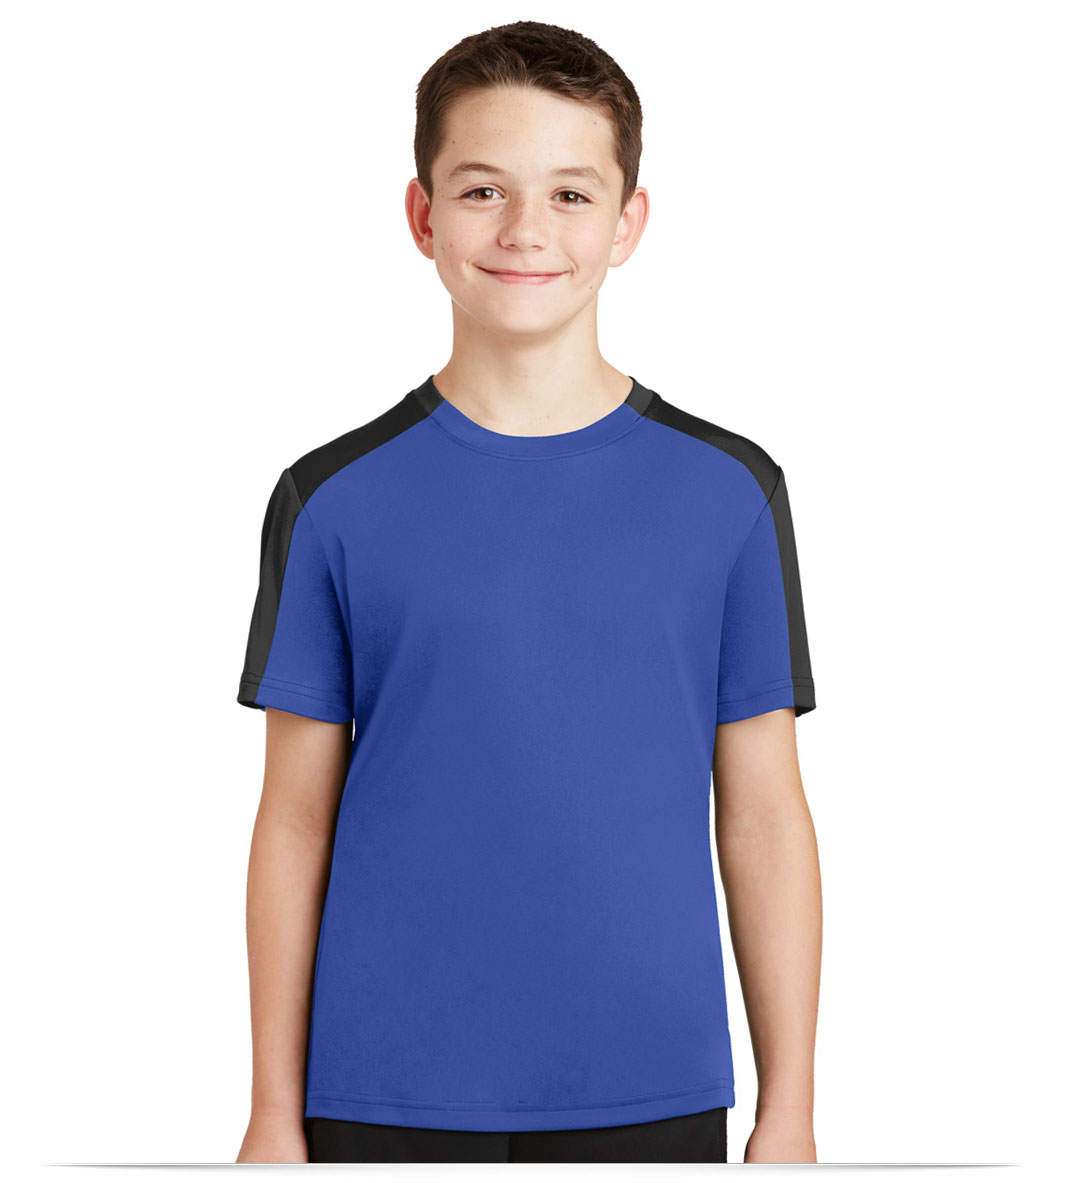 Custom Sport-Tek Youth Sleeve-Blocked Tee